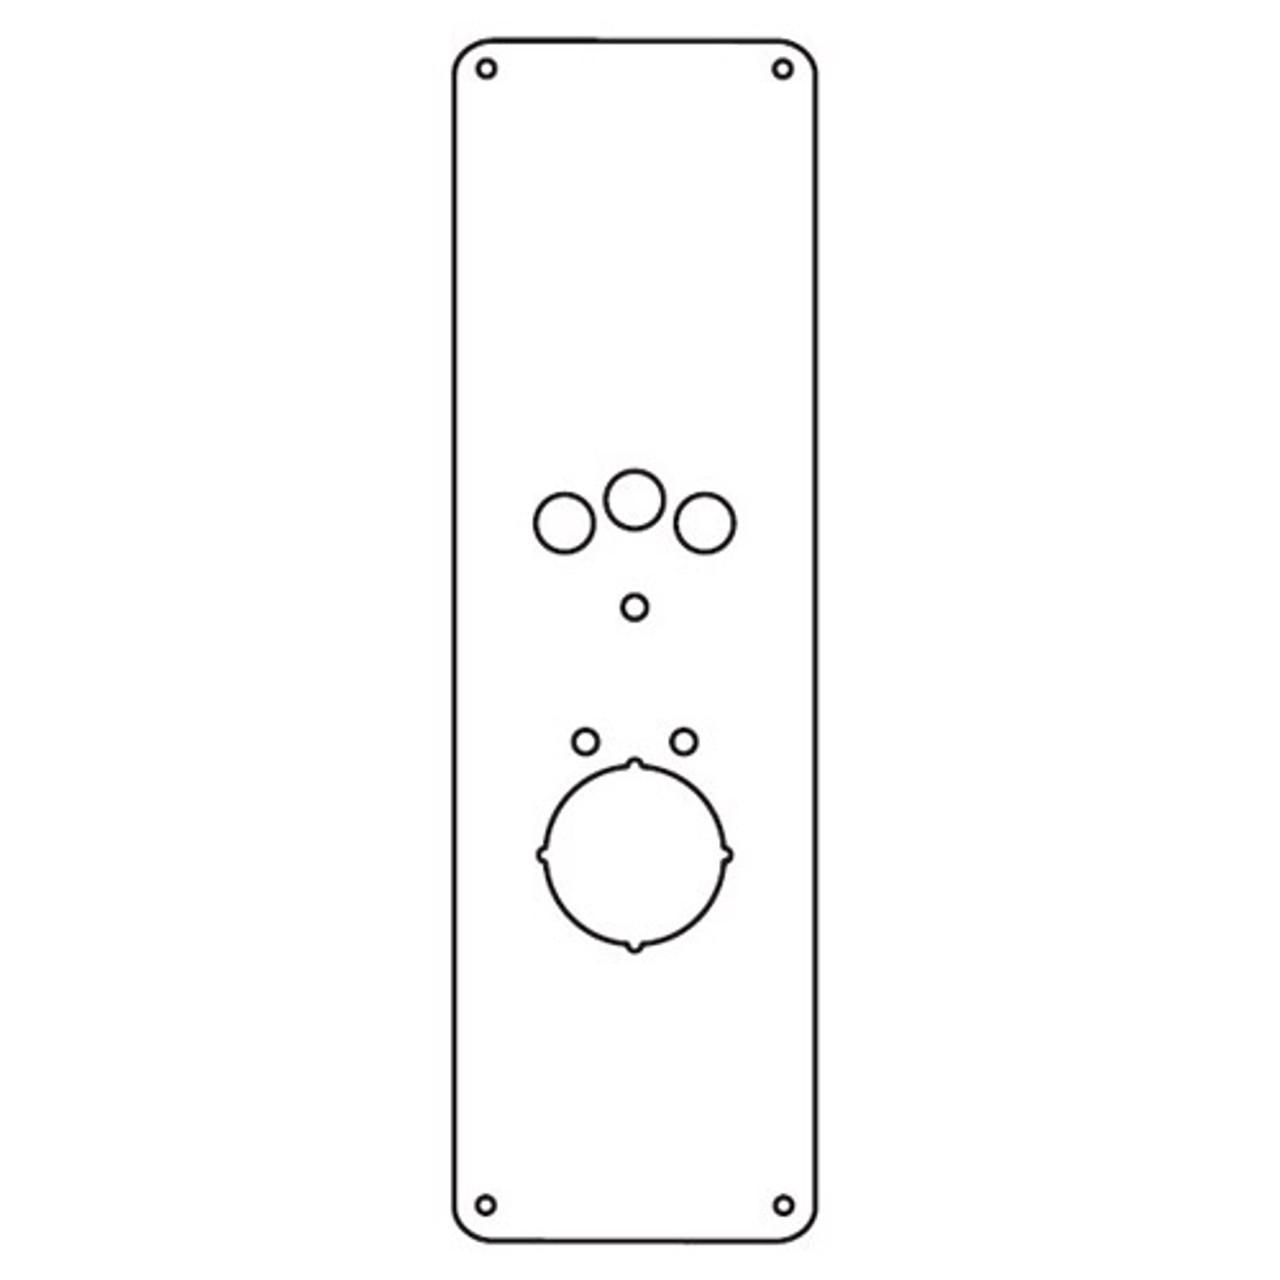 RP-18-630 Don Jo Remodeler Plate in Stainless Steel Finish